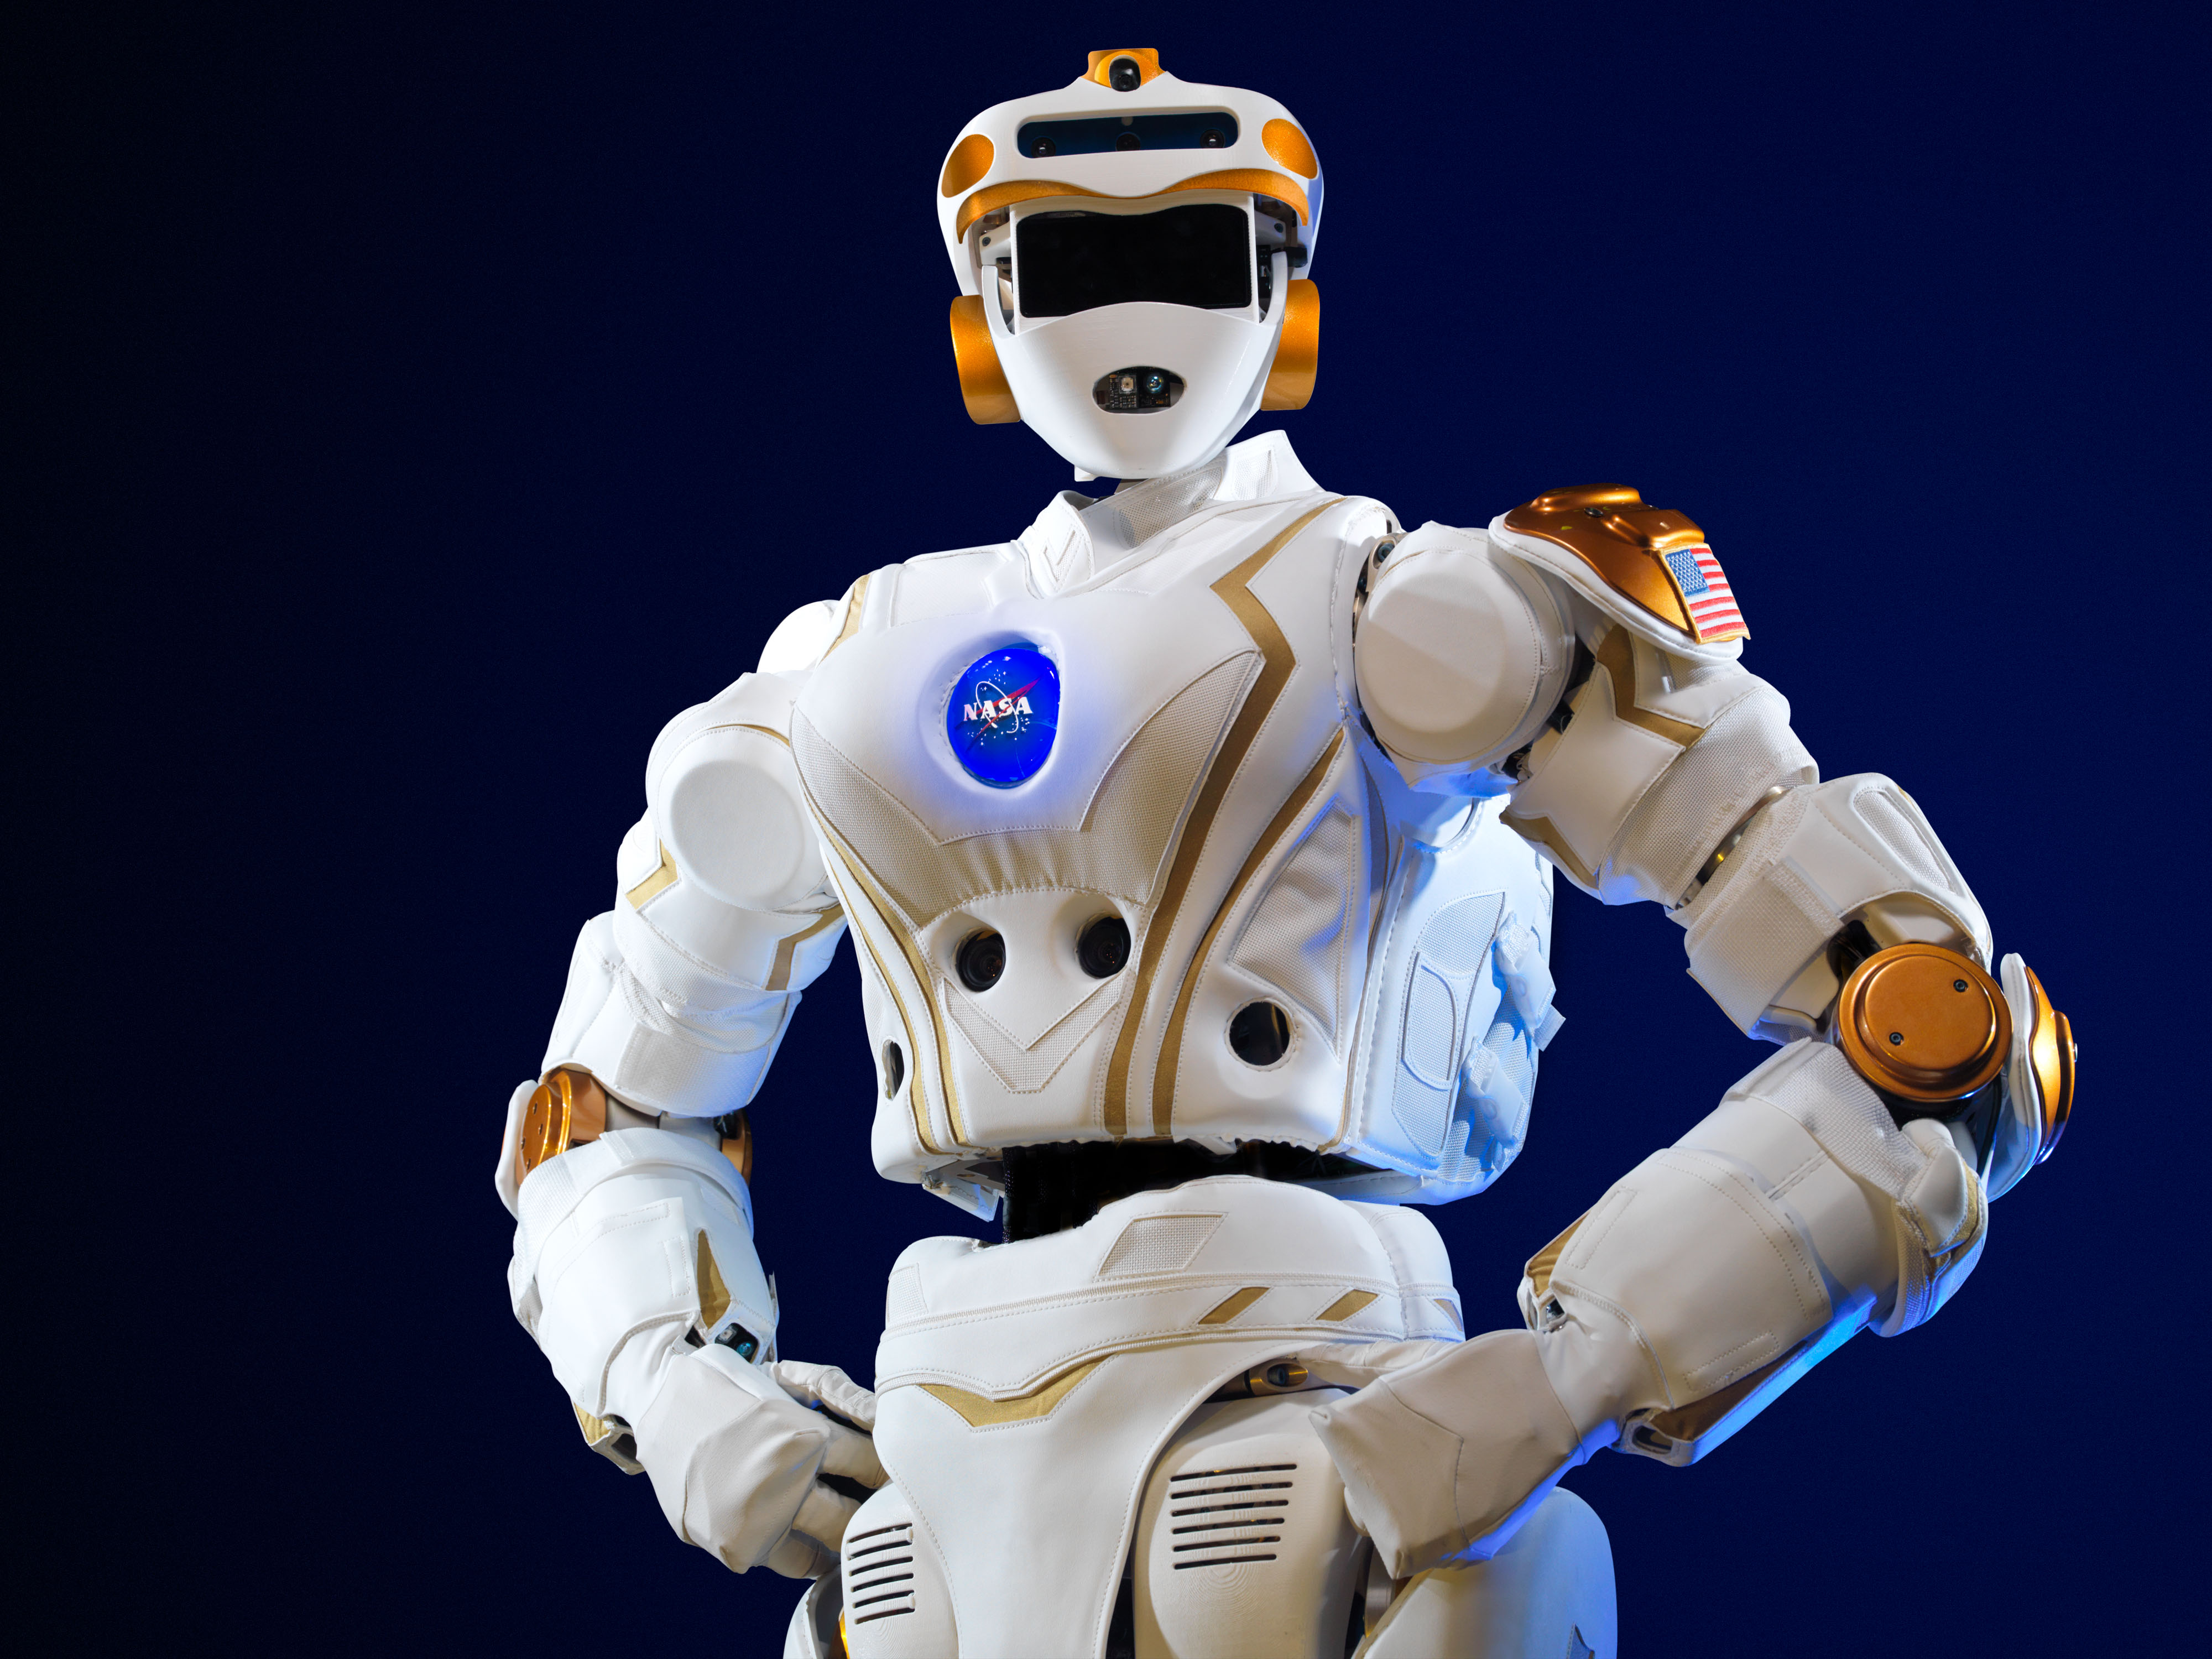 Nasa Space Robotics Challenge Prepares Robots For The Journey To